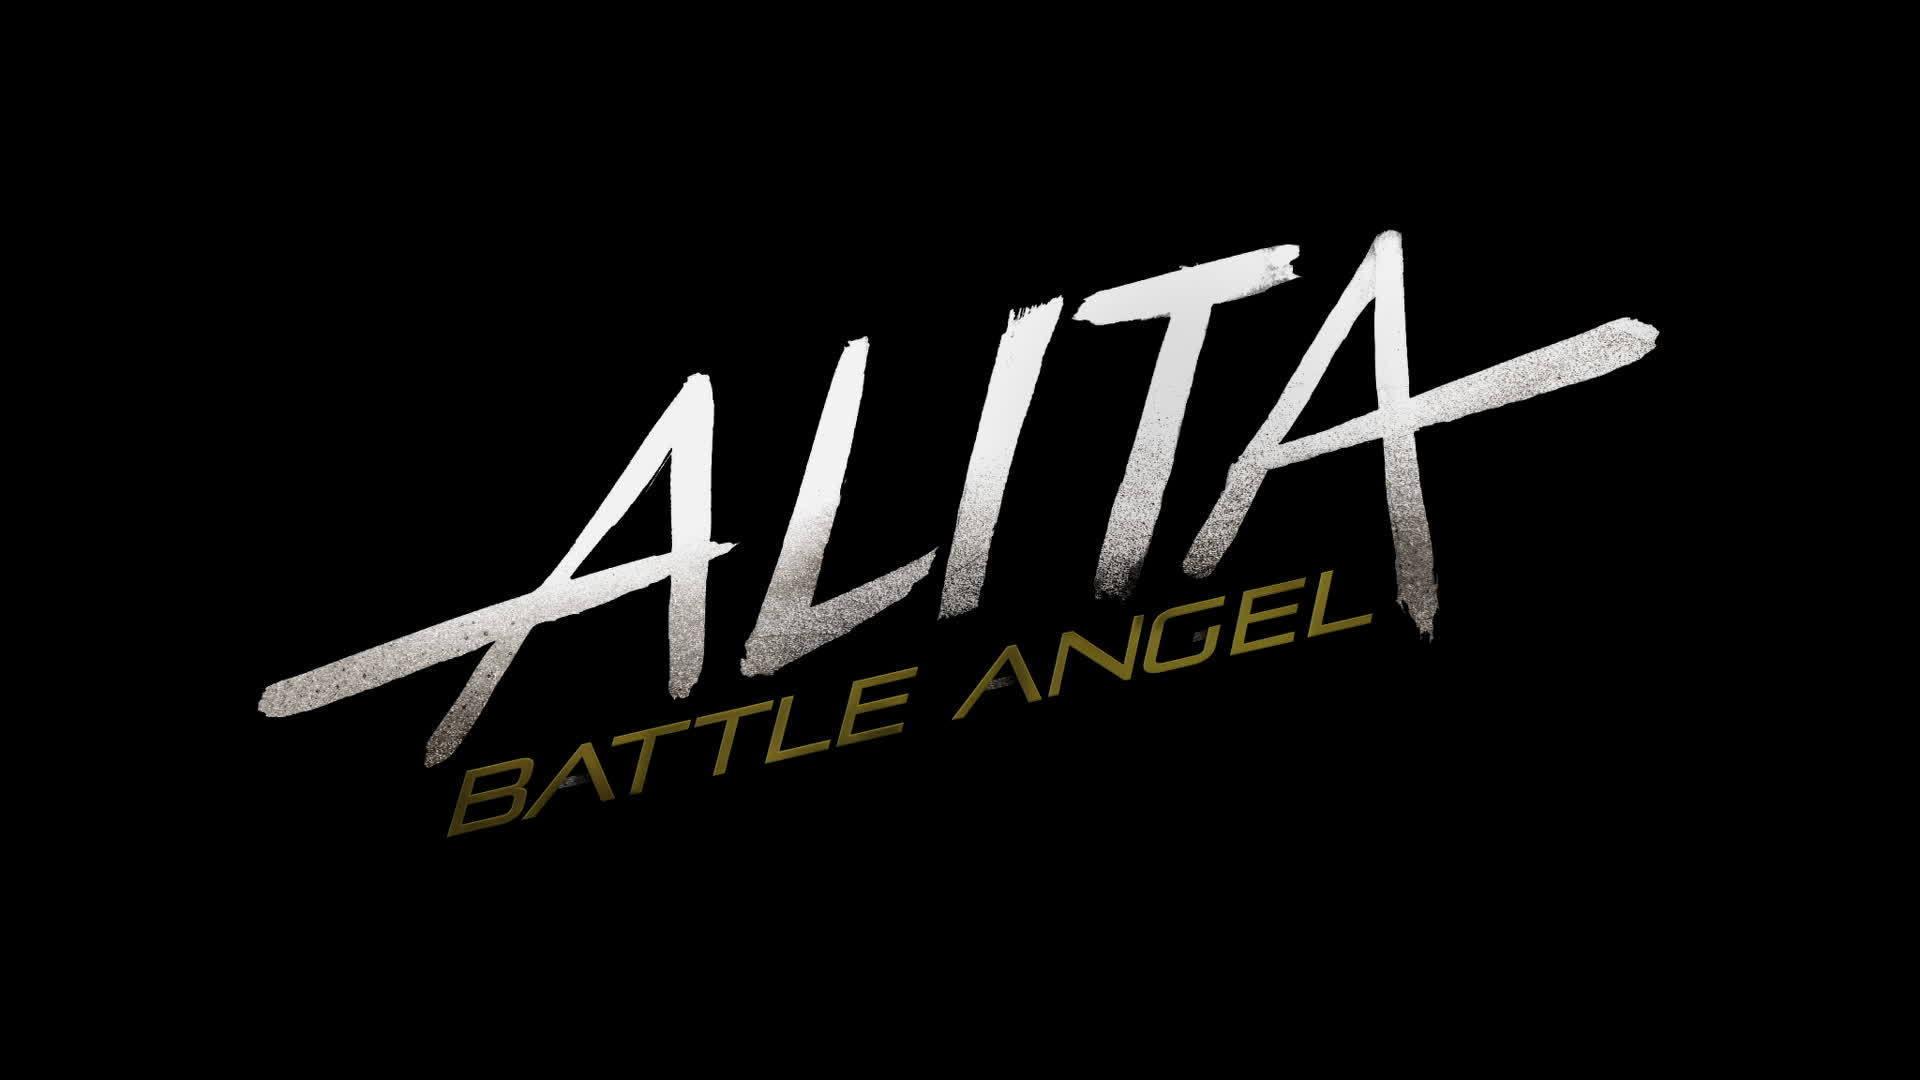 Alita: Battle Angel | Official Trailer